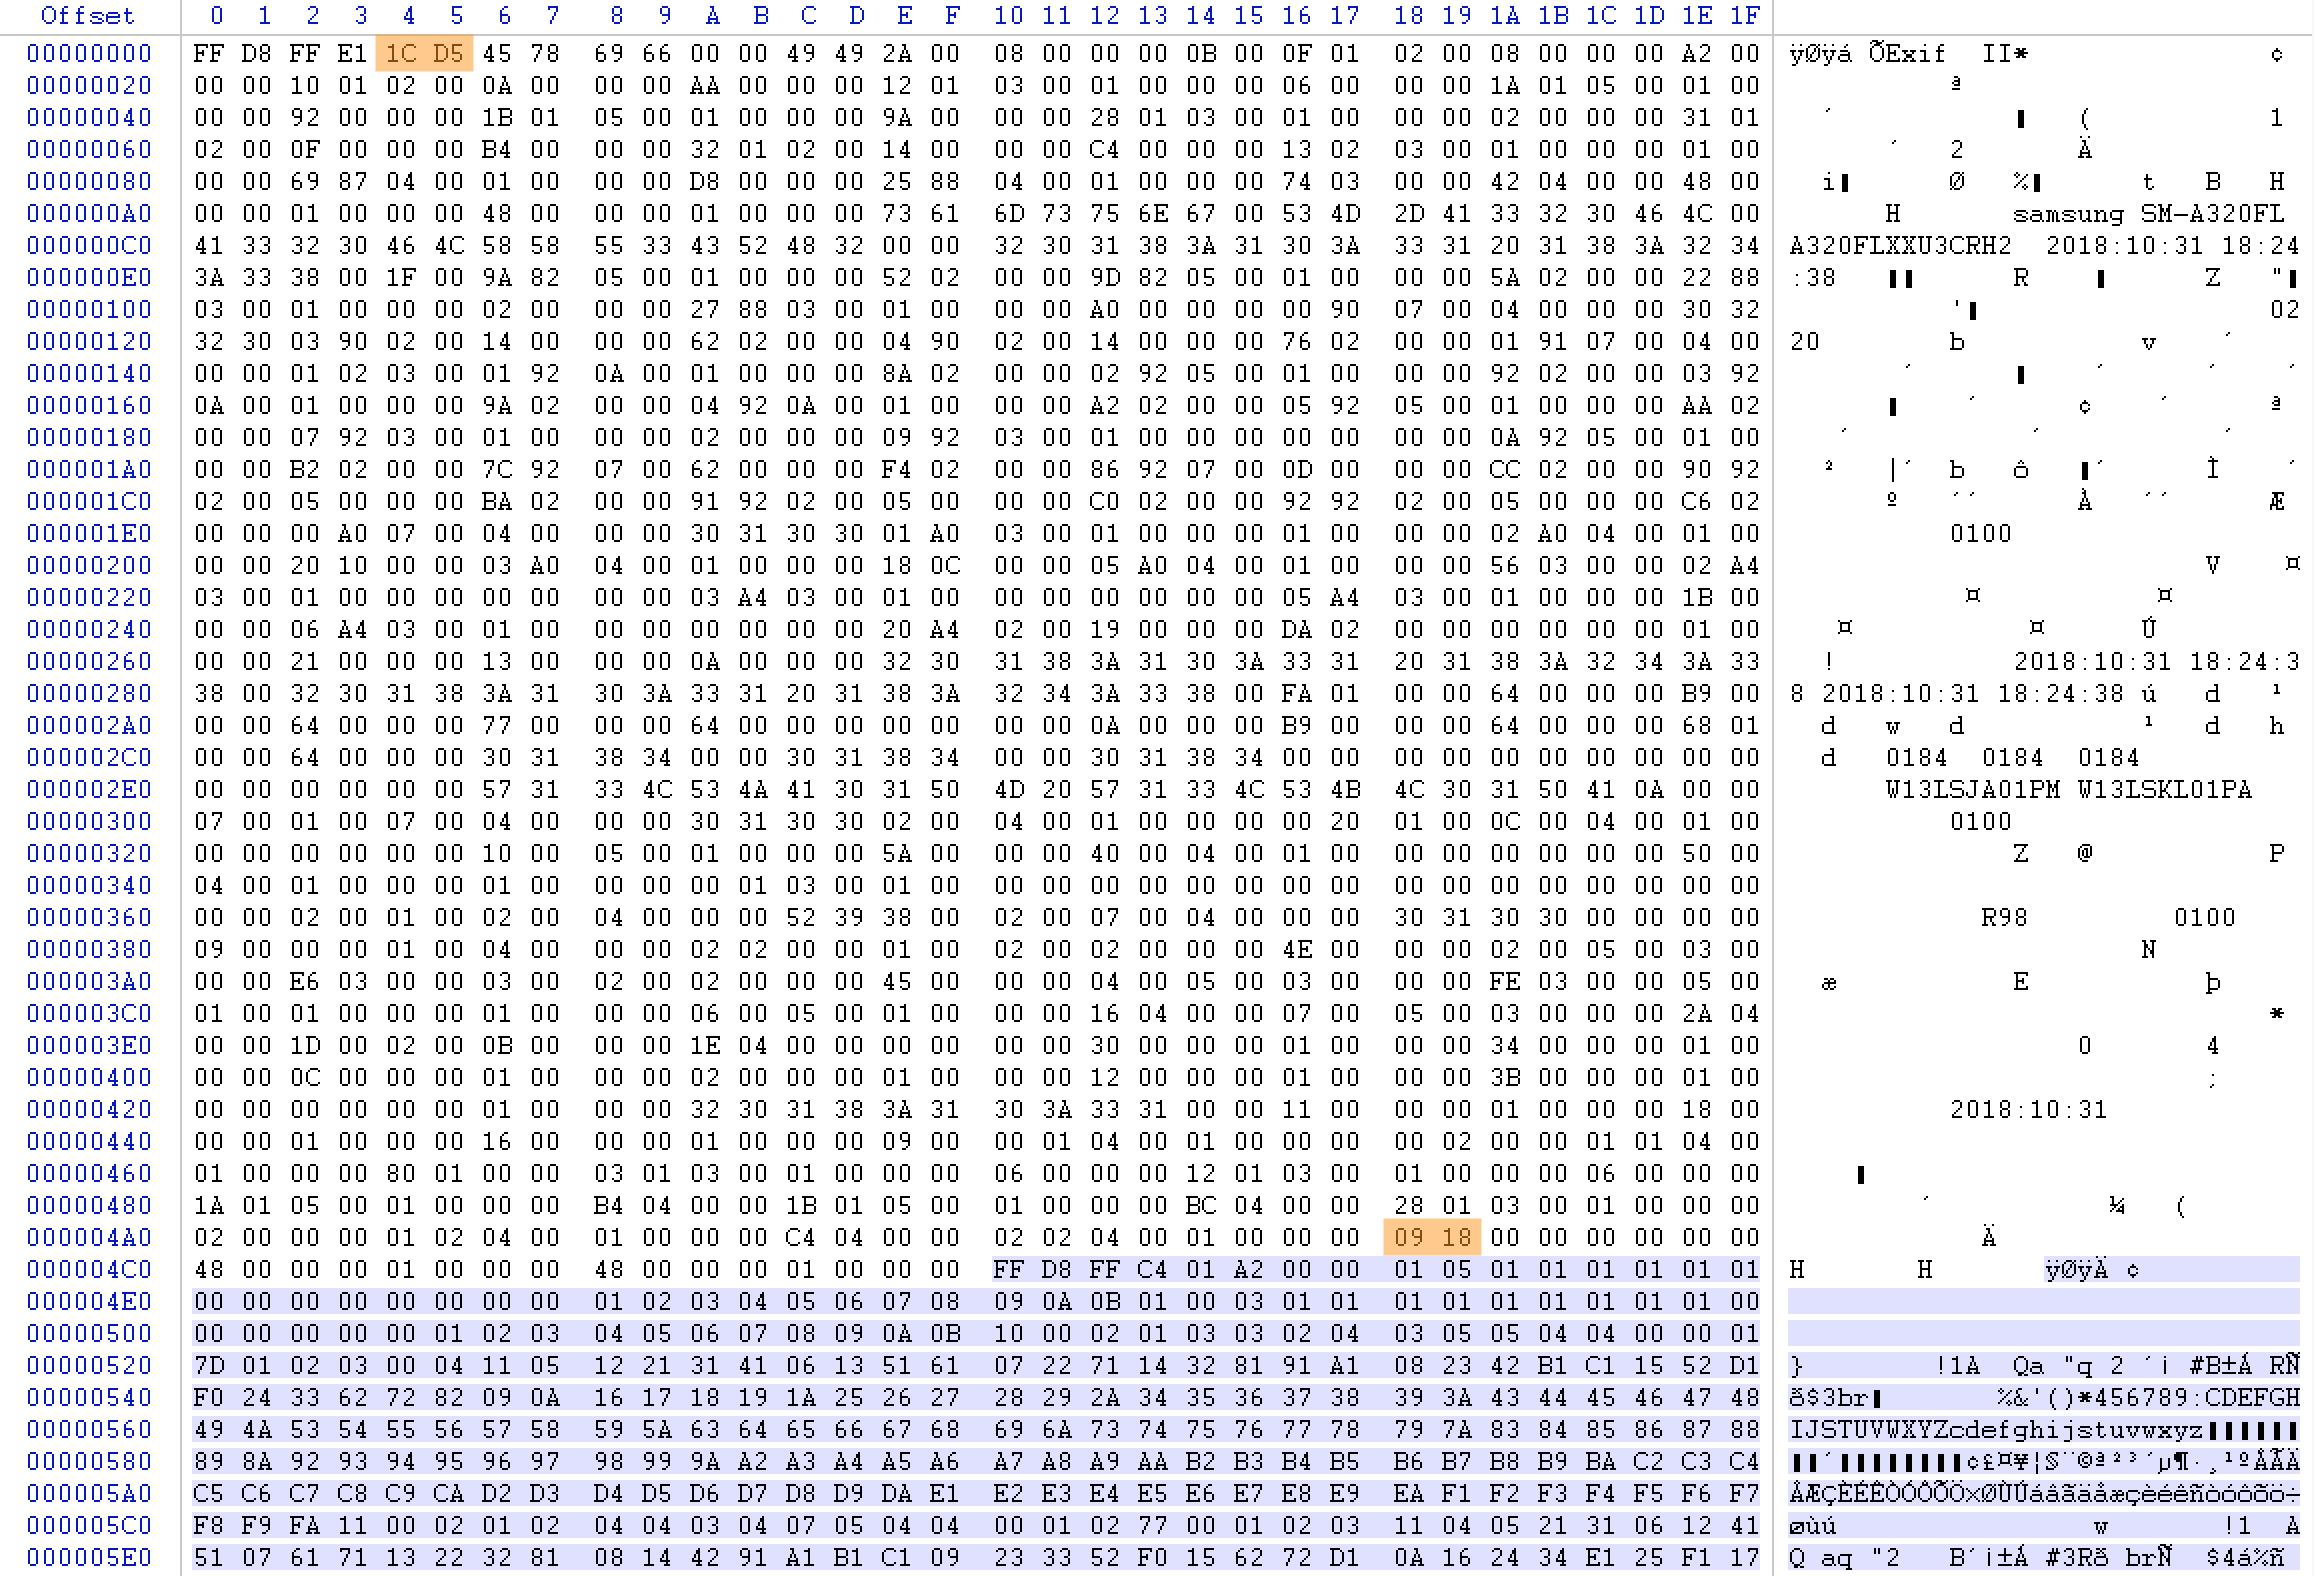 grande hexadecimal